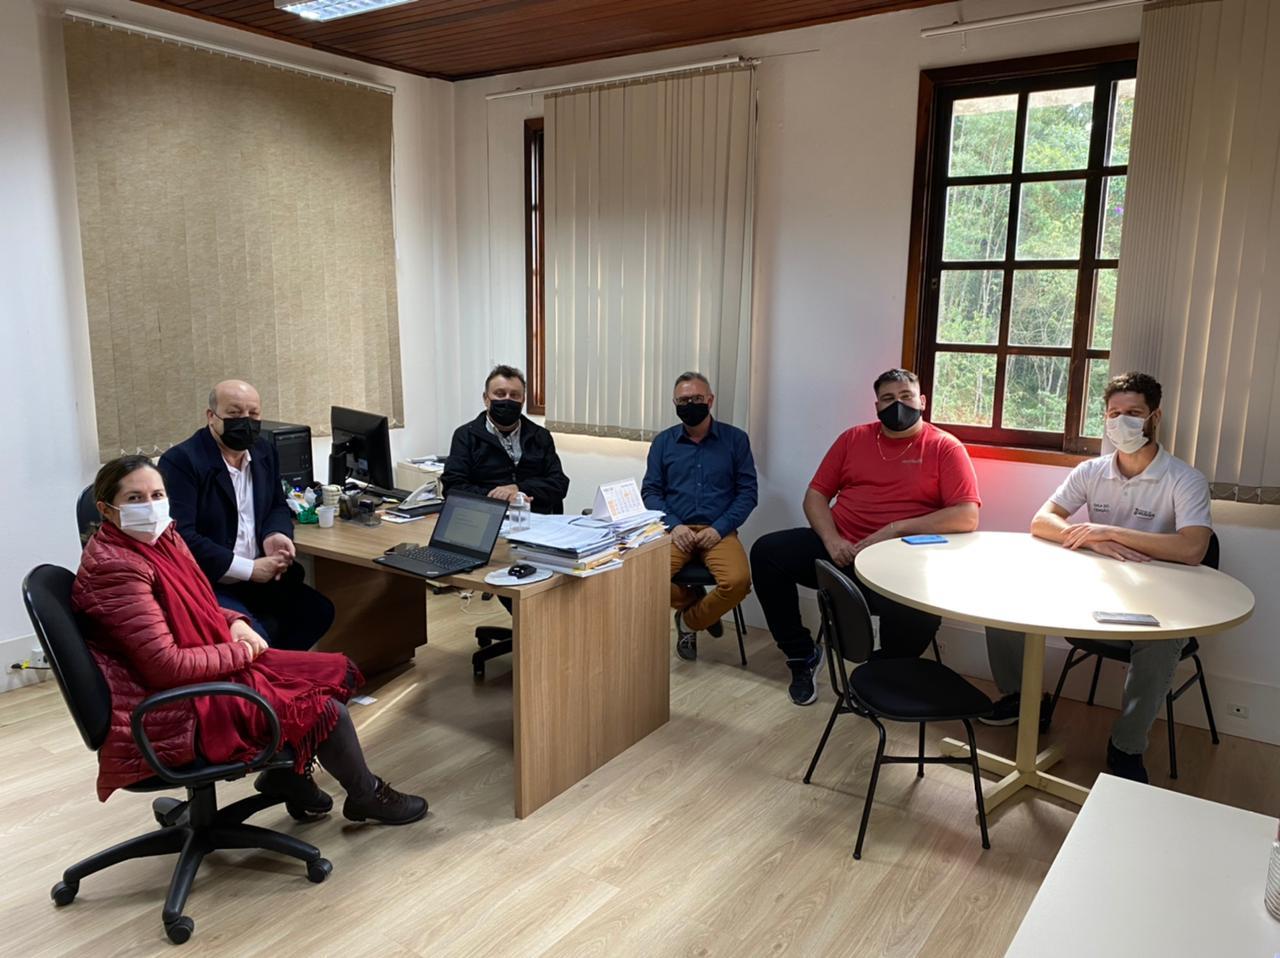 Coordenadores da Sala do Empreendedor participam de consultoria com o Sebrae SC